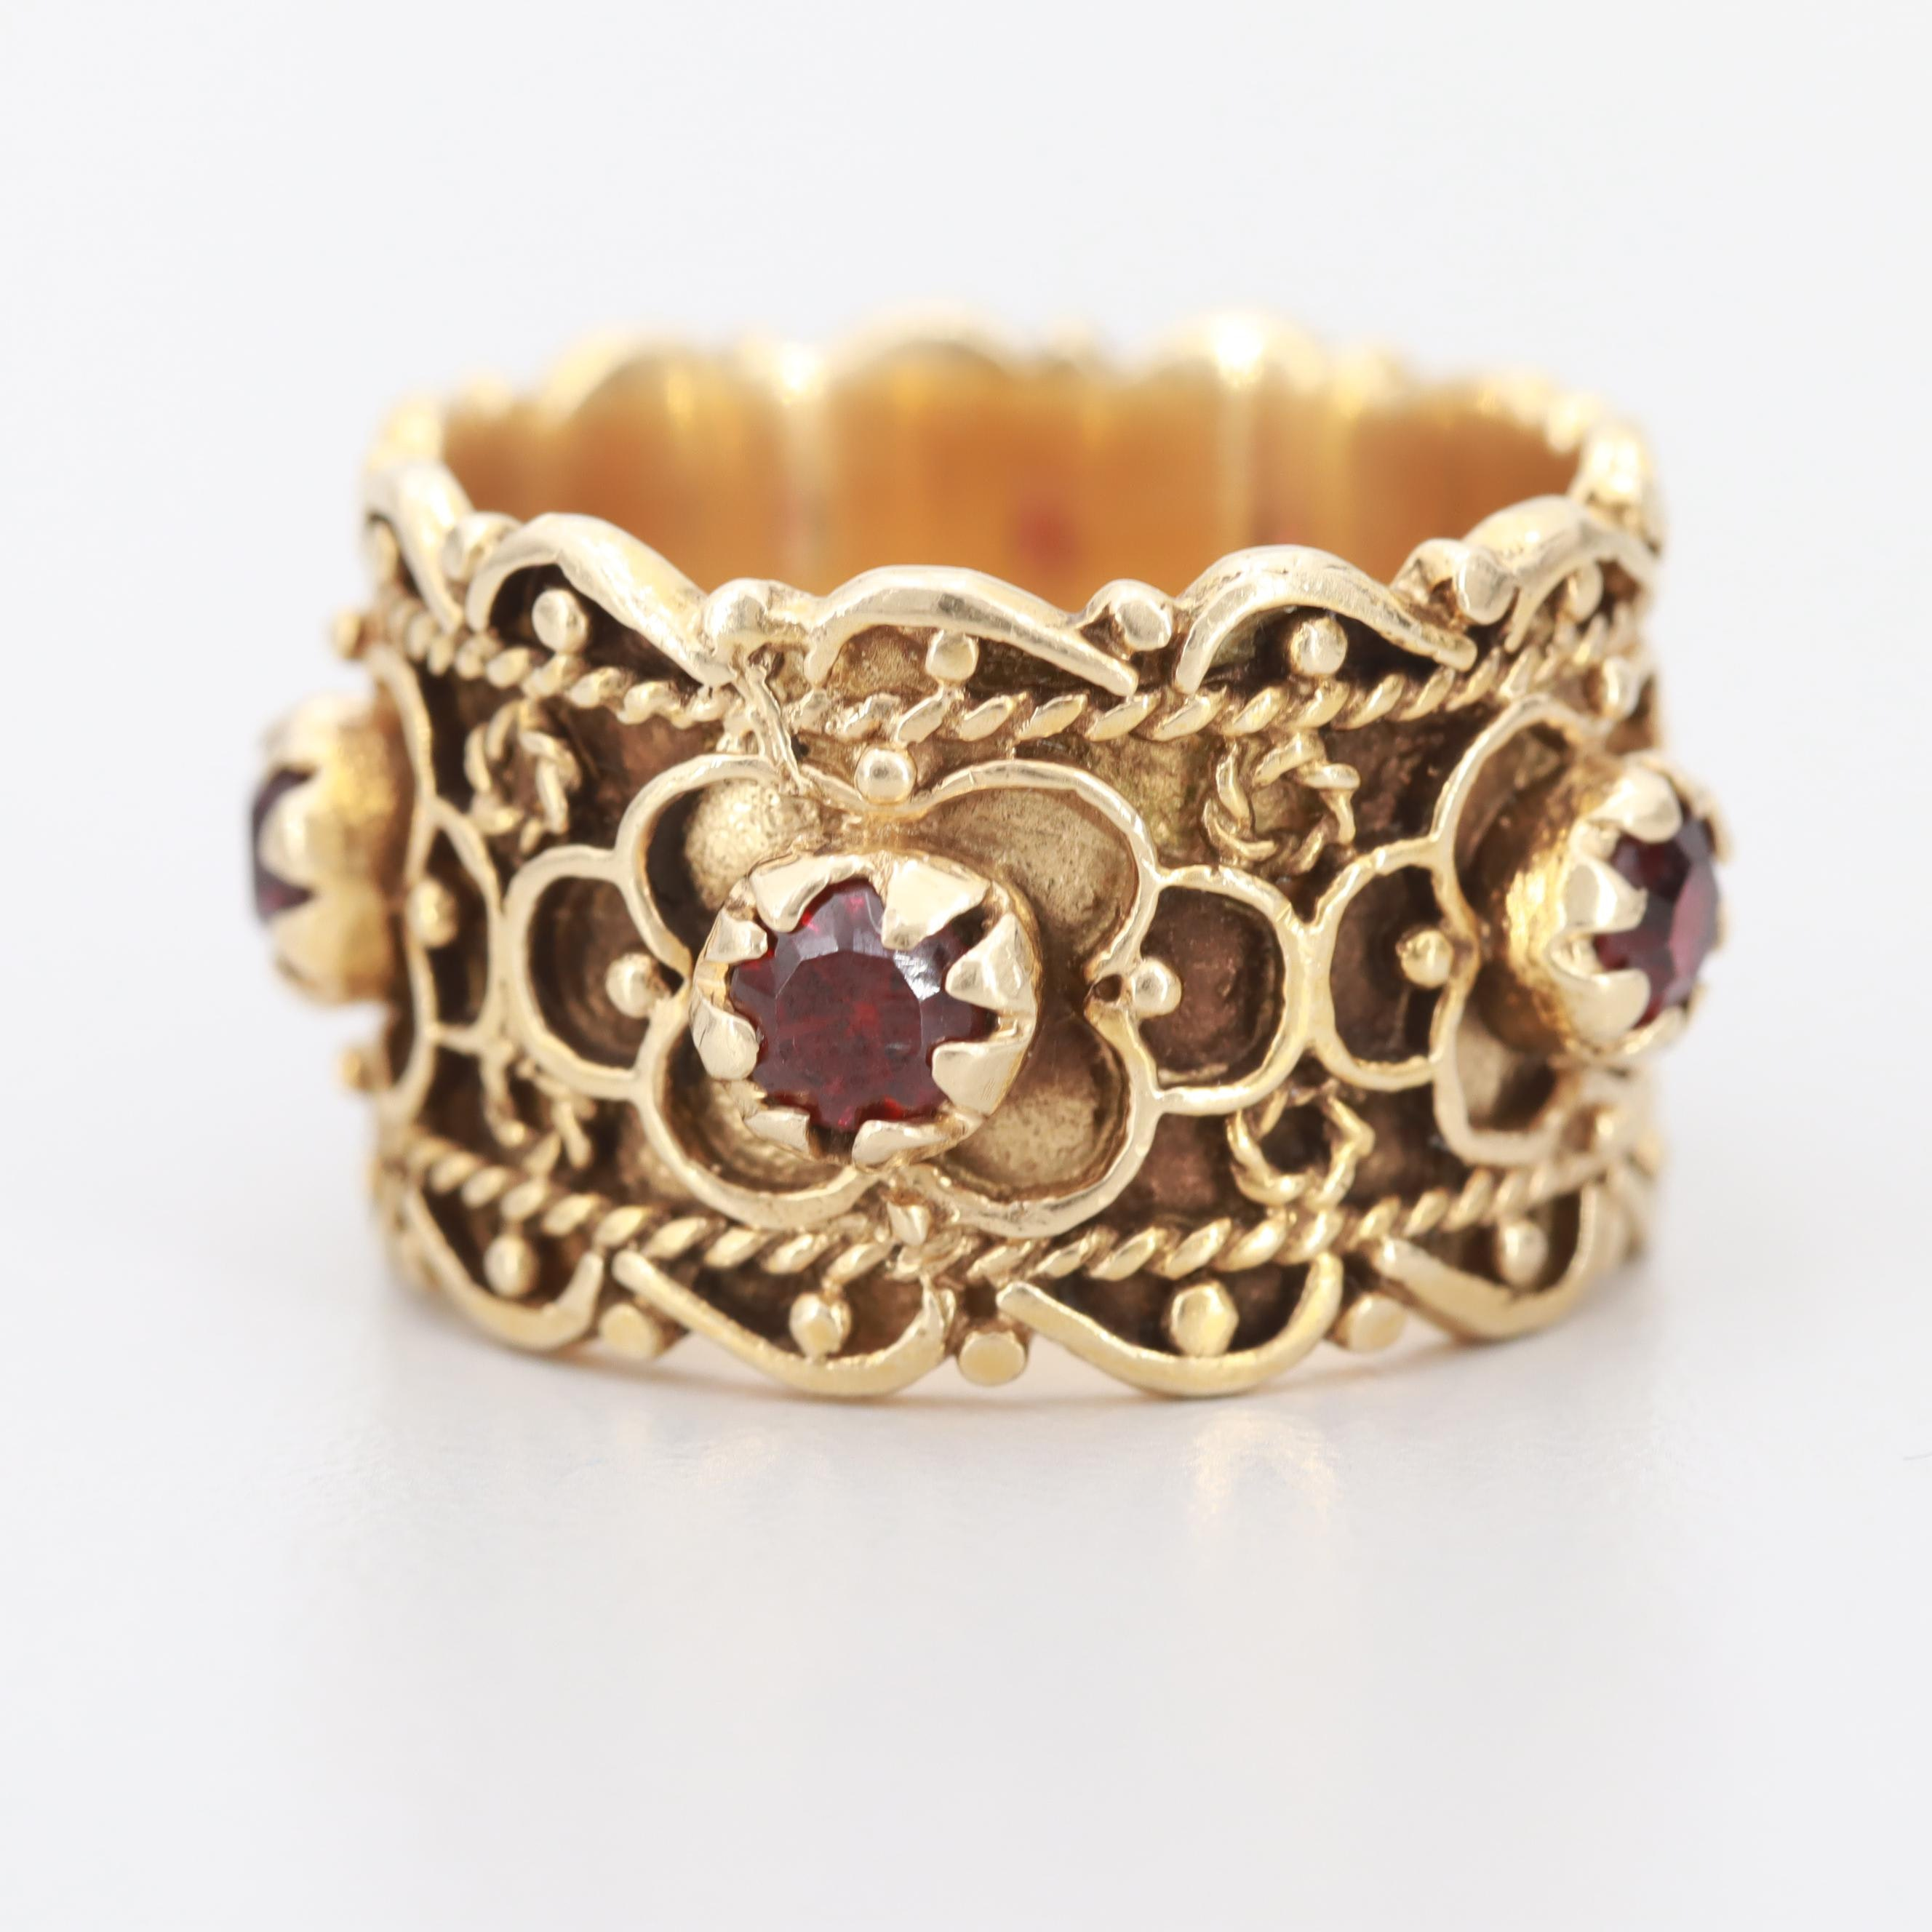 Sidney Berman & Co. Etruscan Style 14K Yellow Gold Garnet Ring